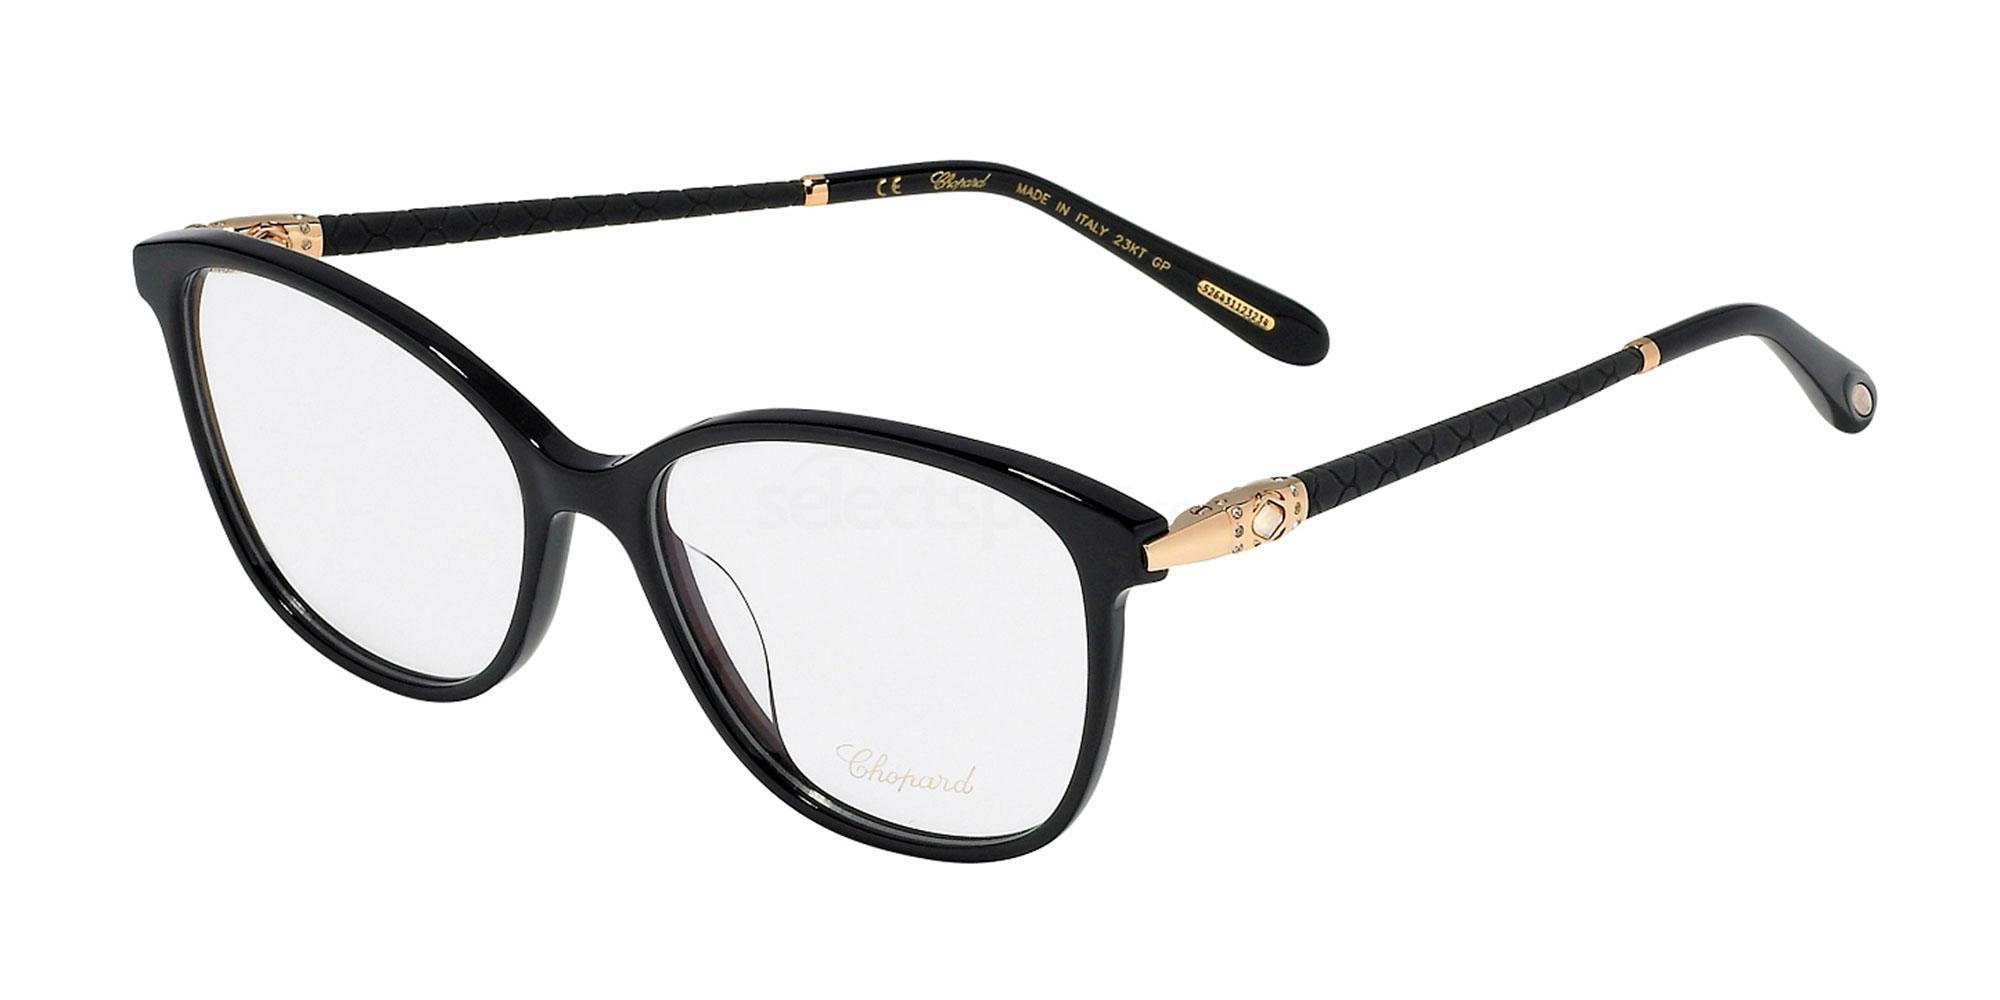 0700 VCH255S Glasses, Chopard